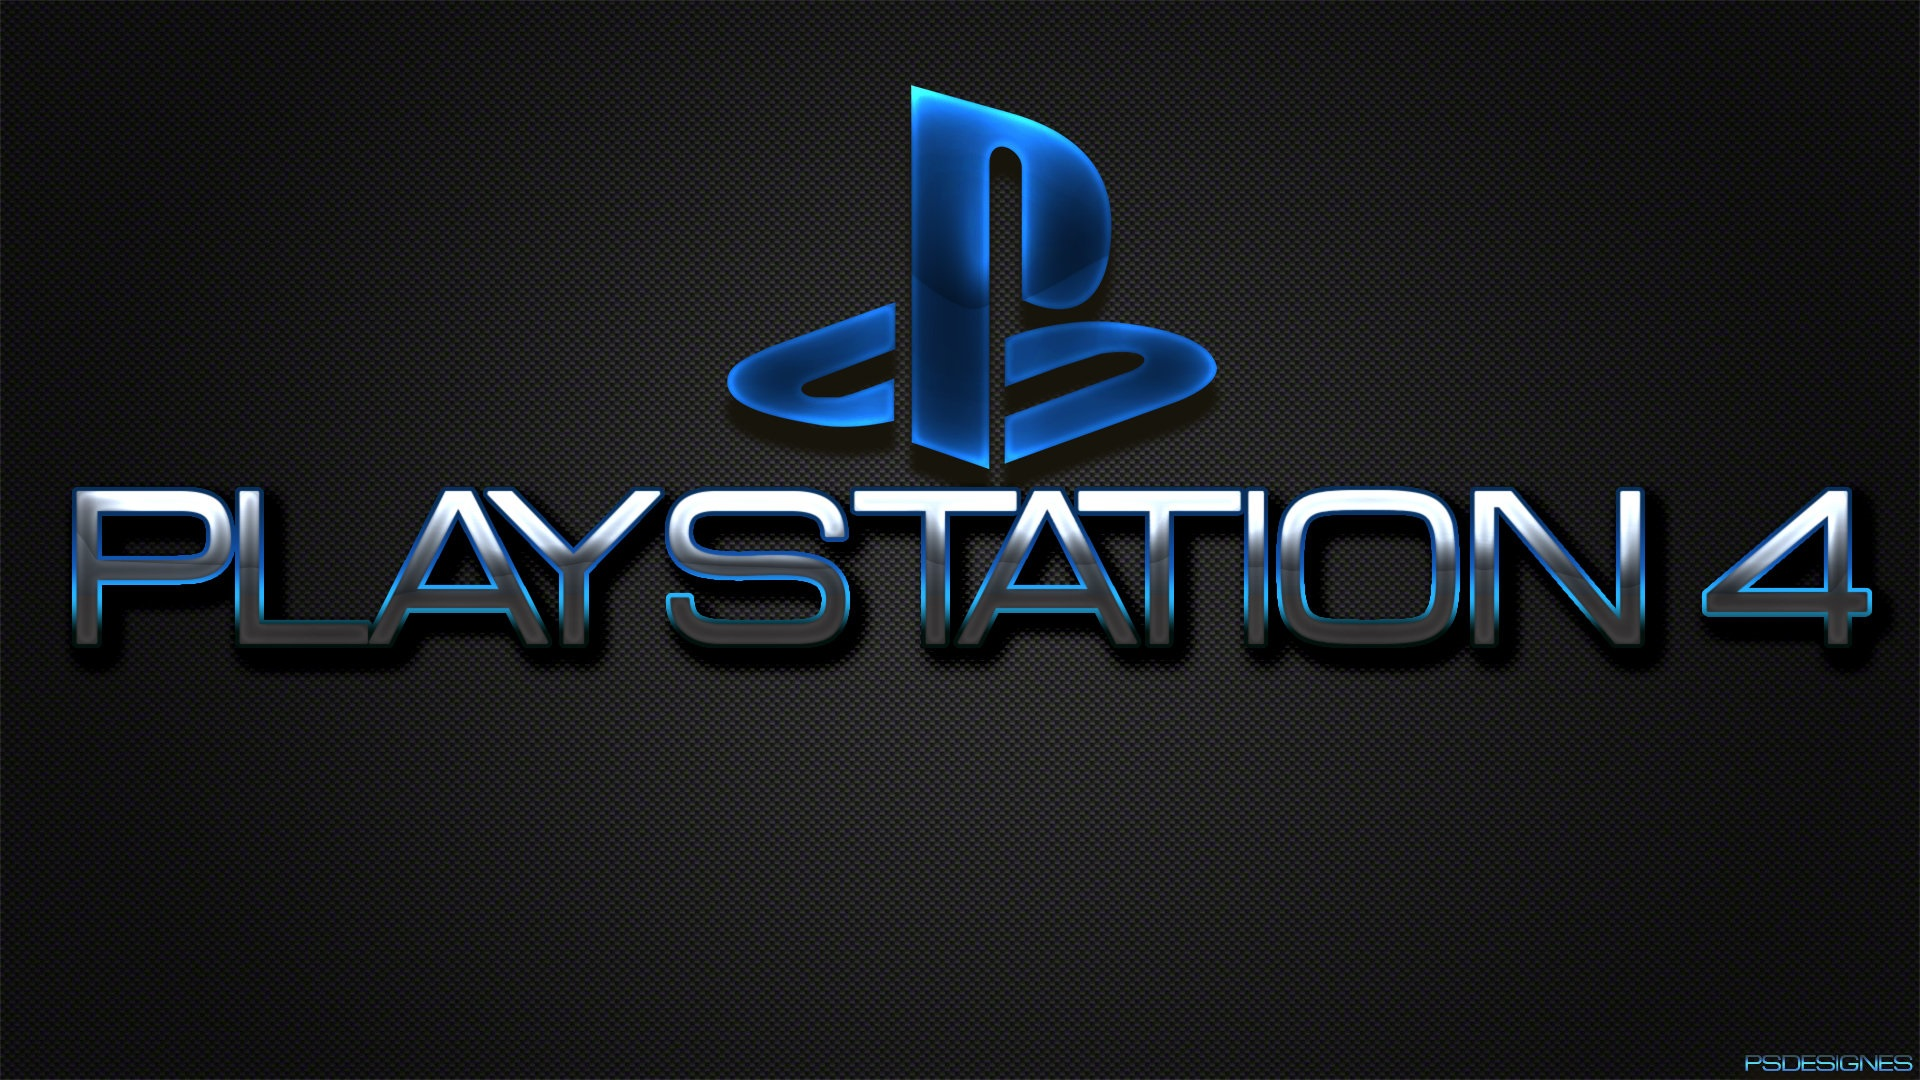 playstation 4 logo, sony 1920x1080 full hd hintergrundbilder, hd, bild